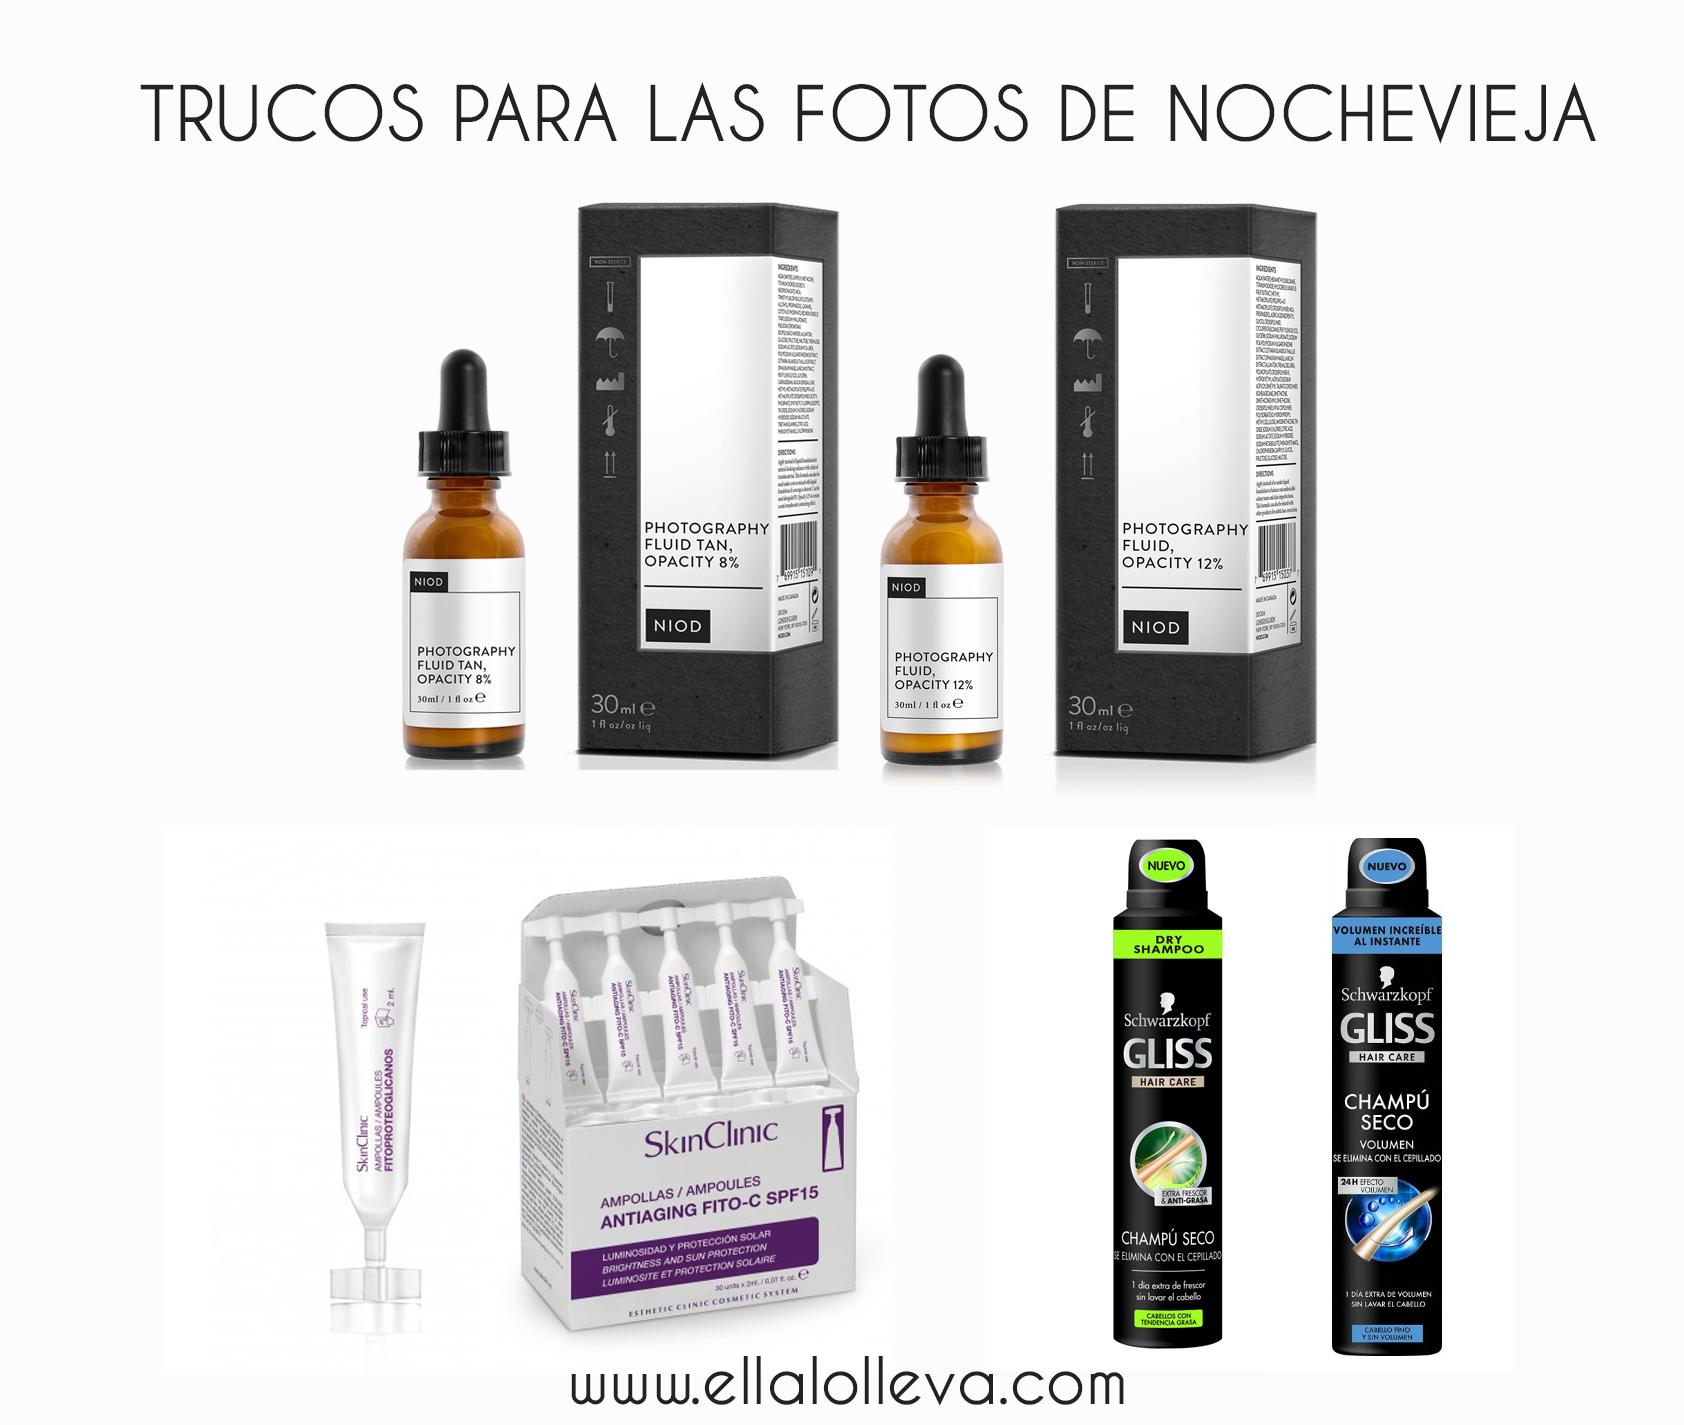 trucos-fotos-nochevieja3